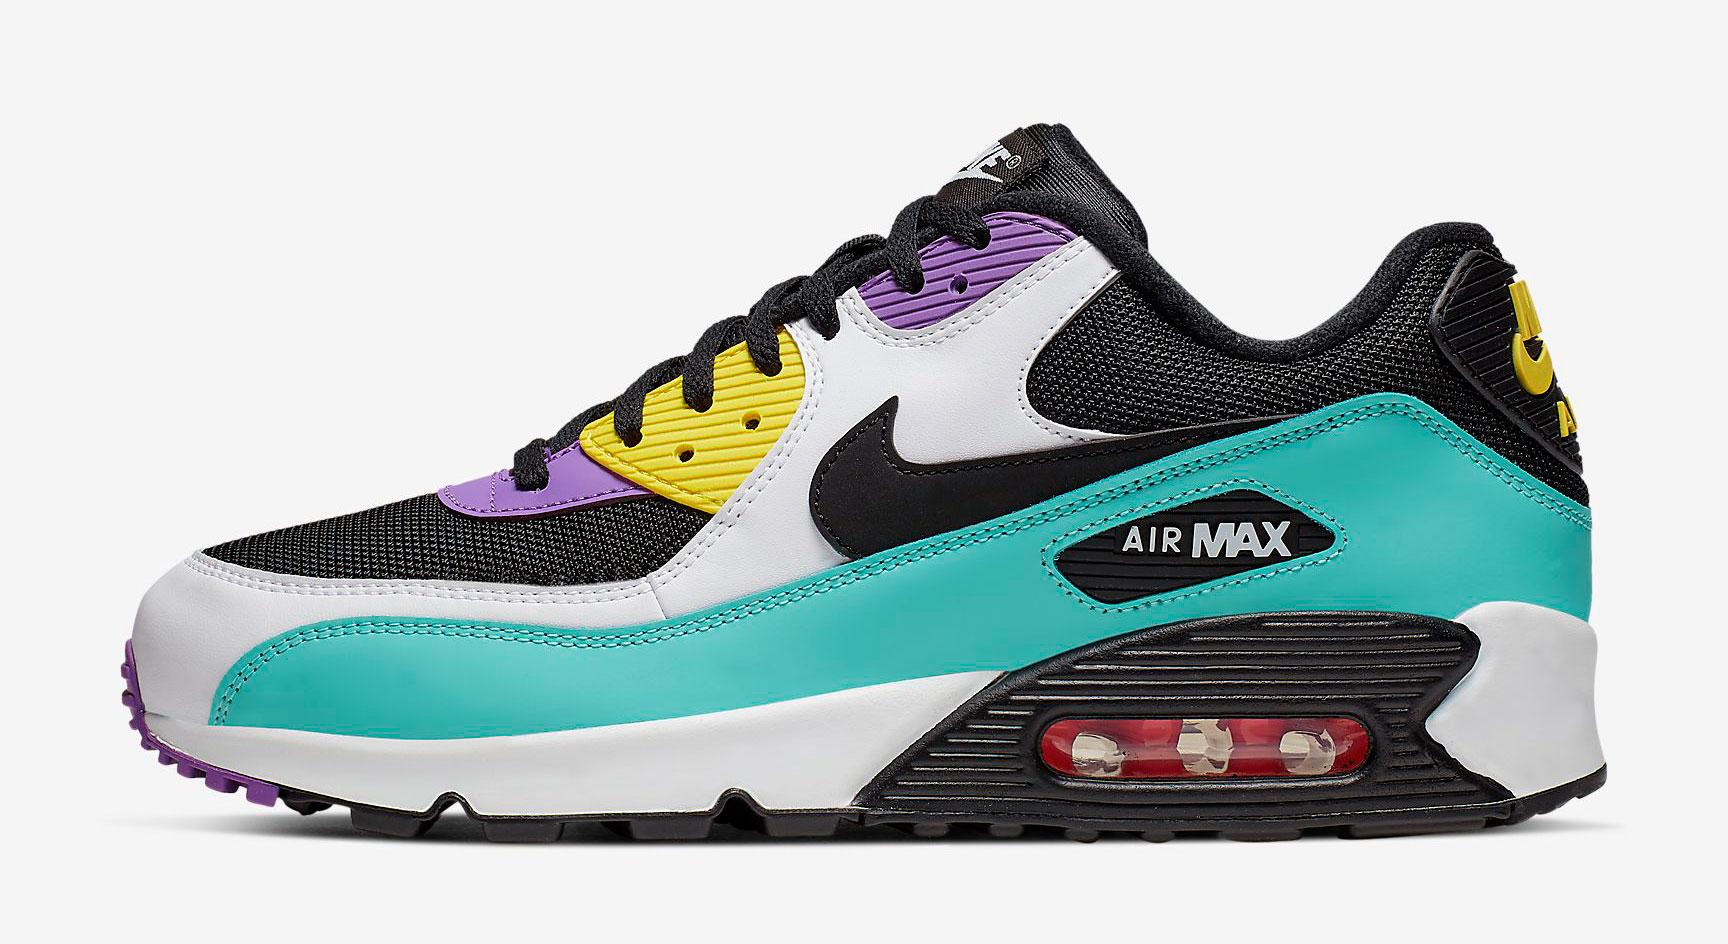 nike-air-max-90-black-bright-violet-pink-blast-release-date